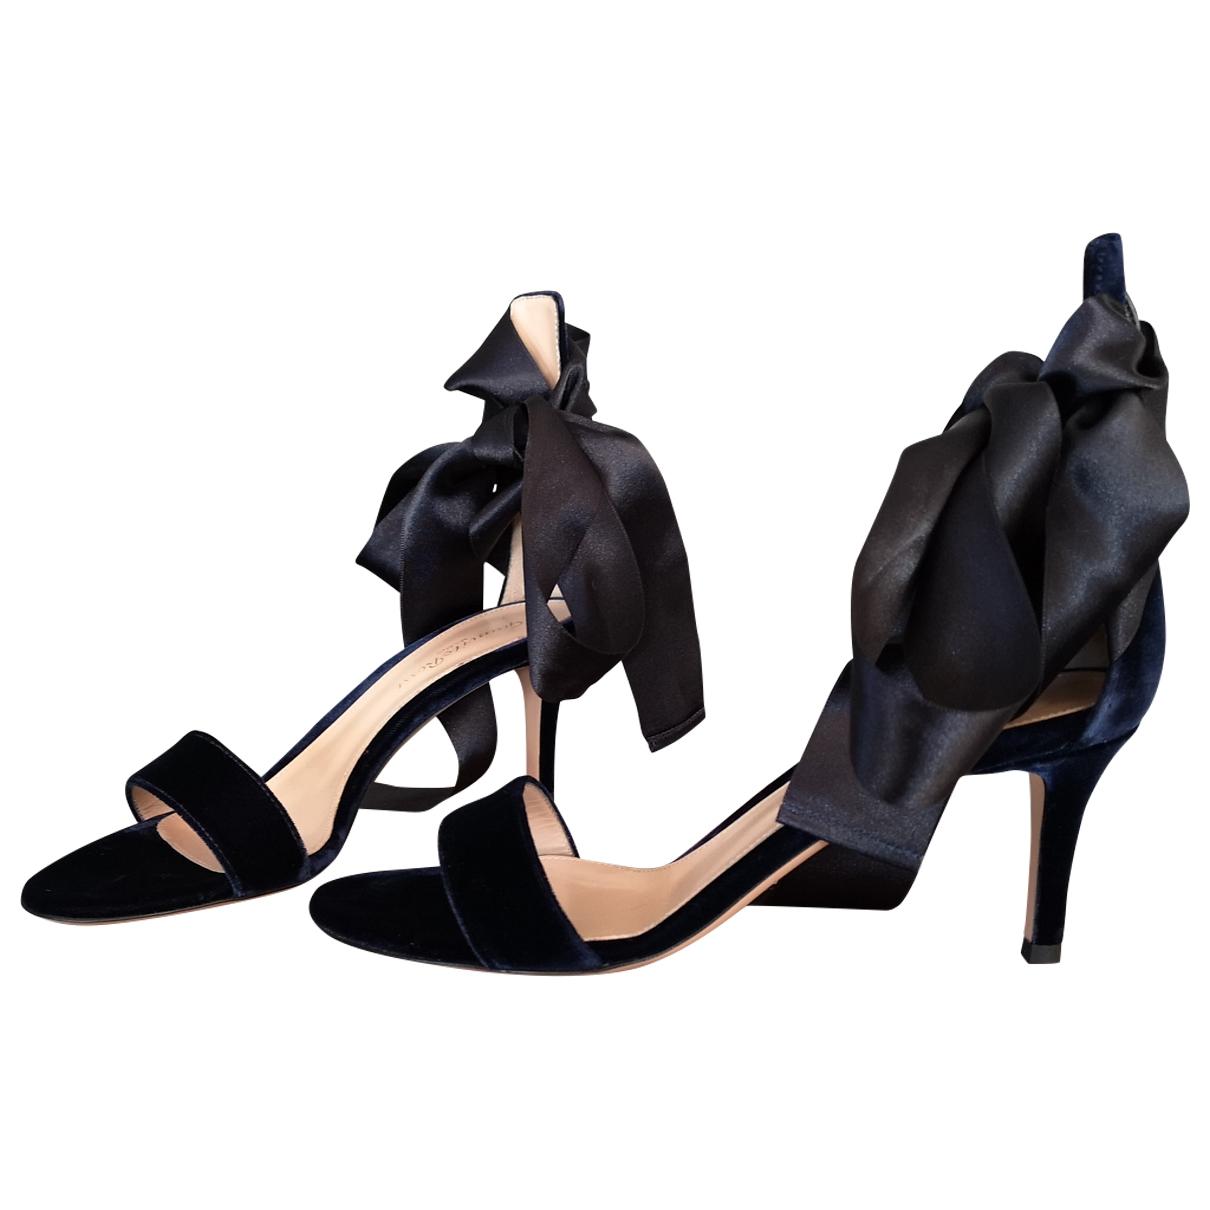 Sandalias de Terciopelo Gianvito Rossi